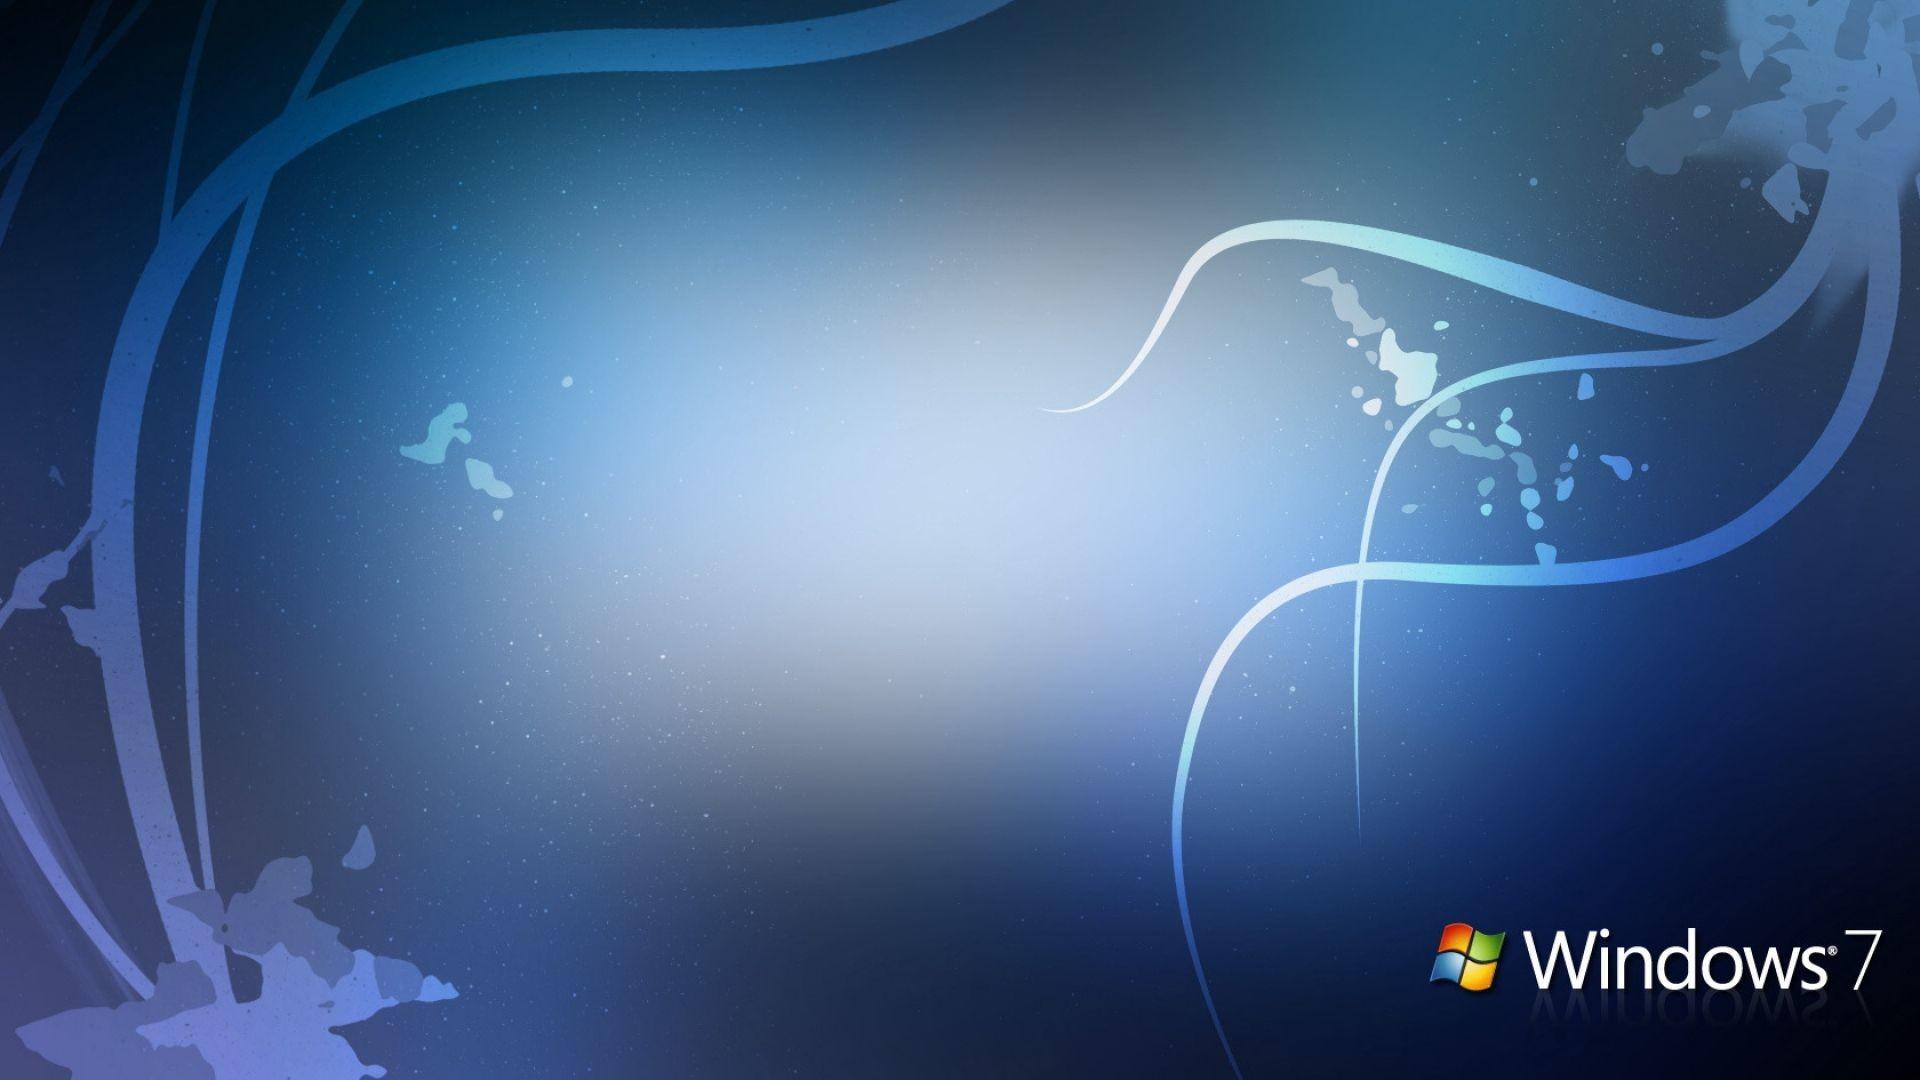 Windows 7 Pics